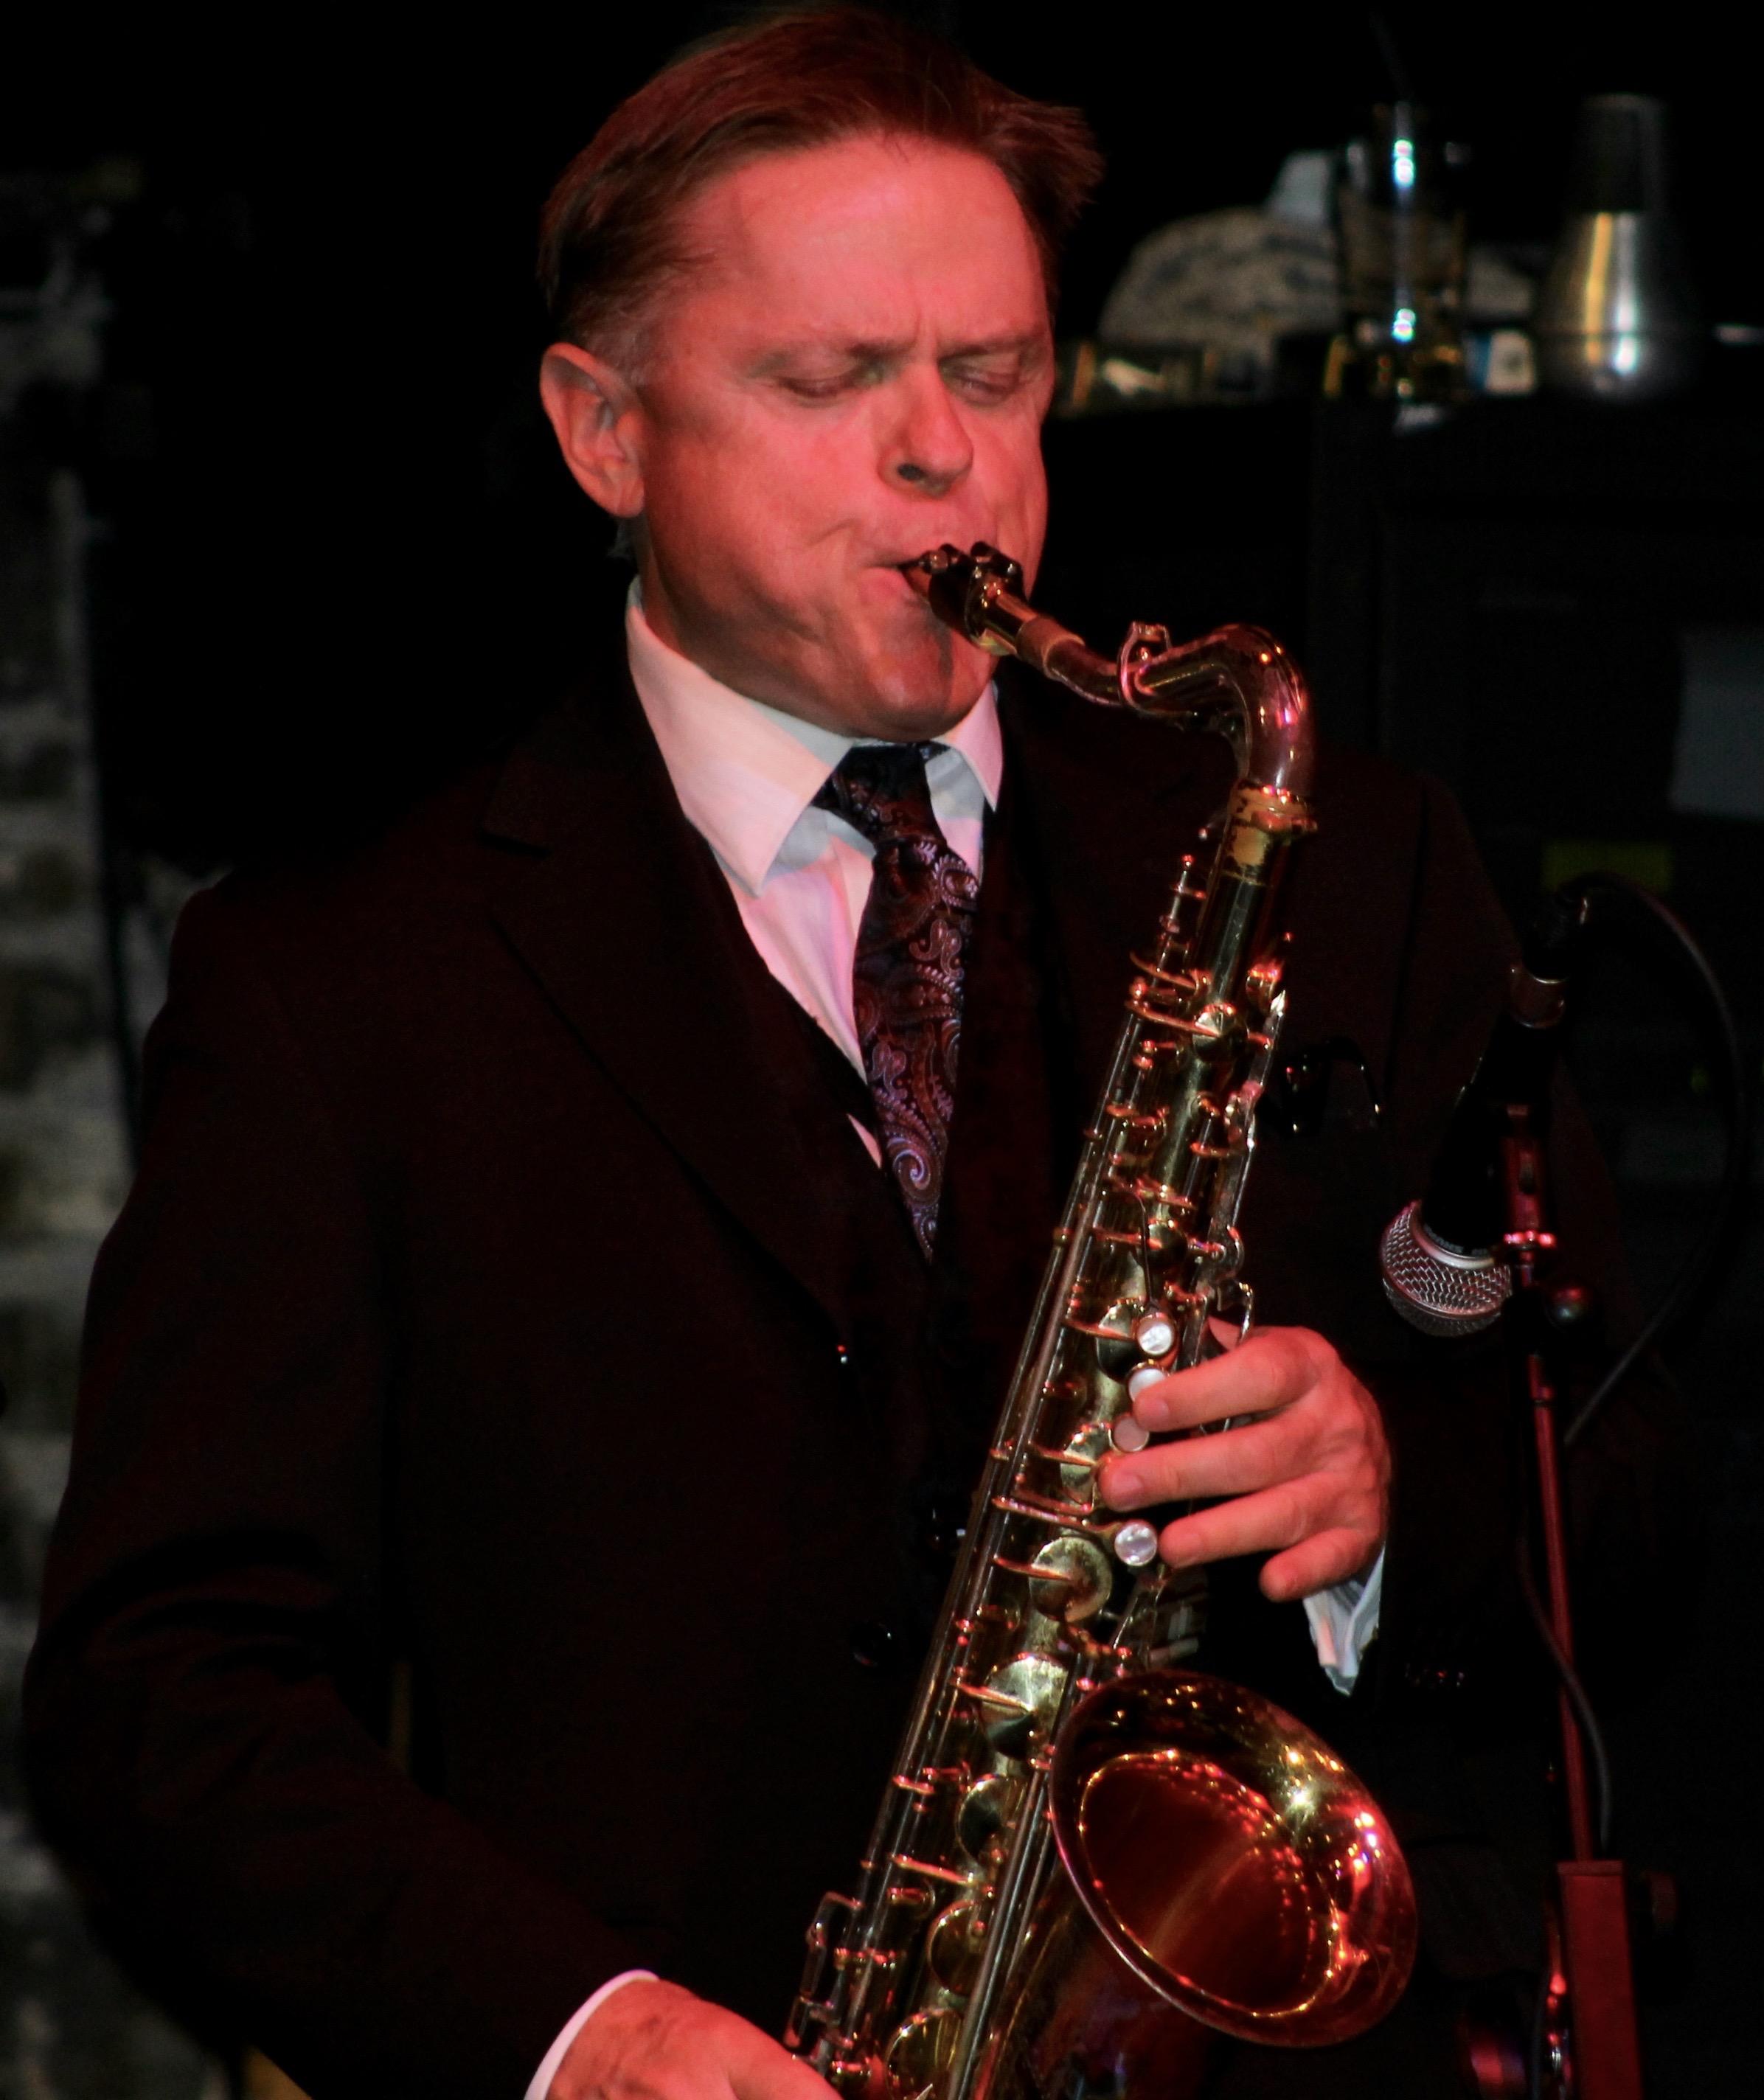 Jazz musician John MacMurchy at the Ken Page Memorial Trust - Oct. 2015